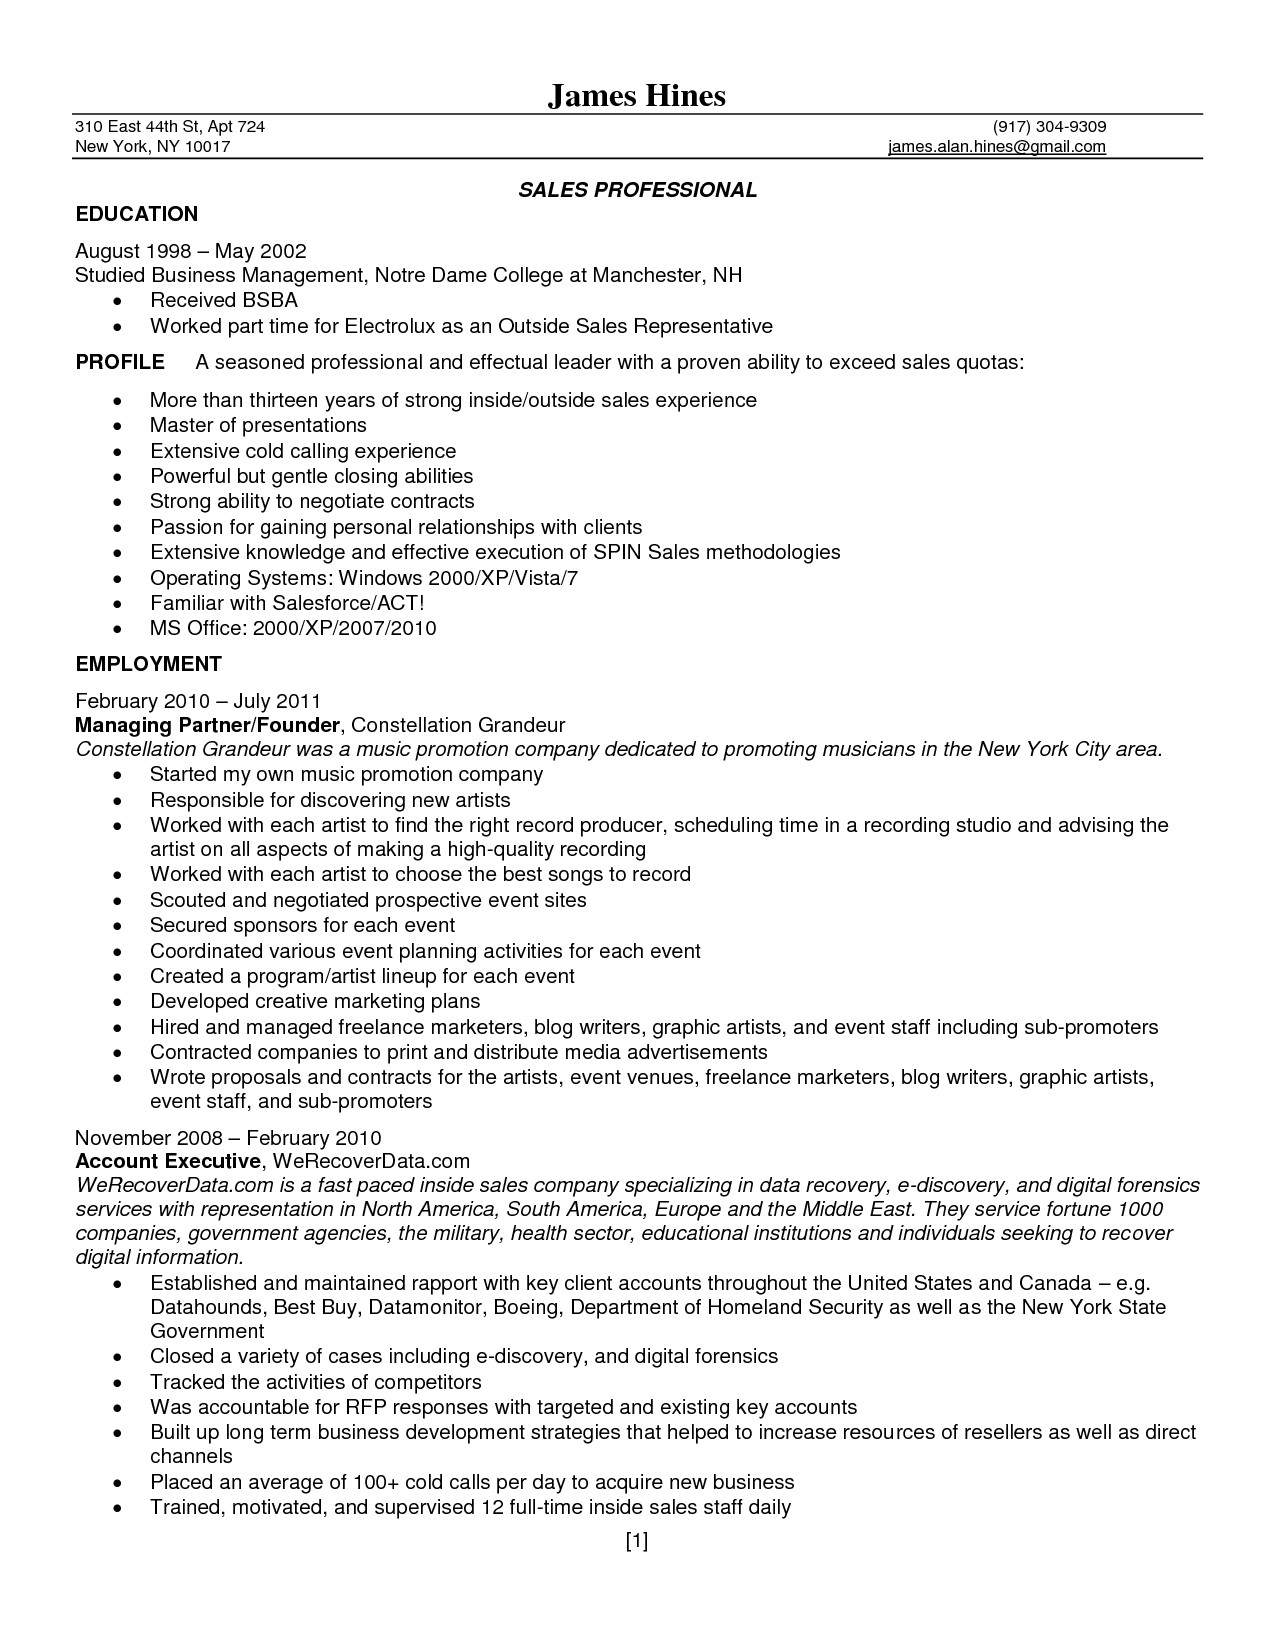 Jeweler Resume Sample Sample Resume for Jewelry Sales associate Free Resume